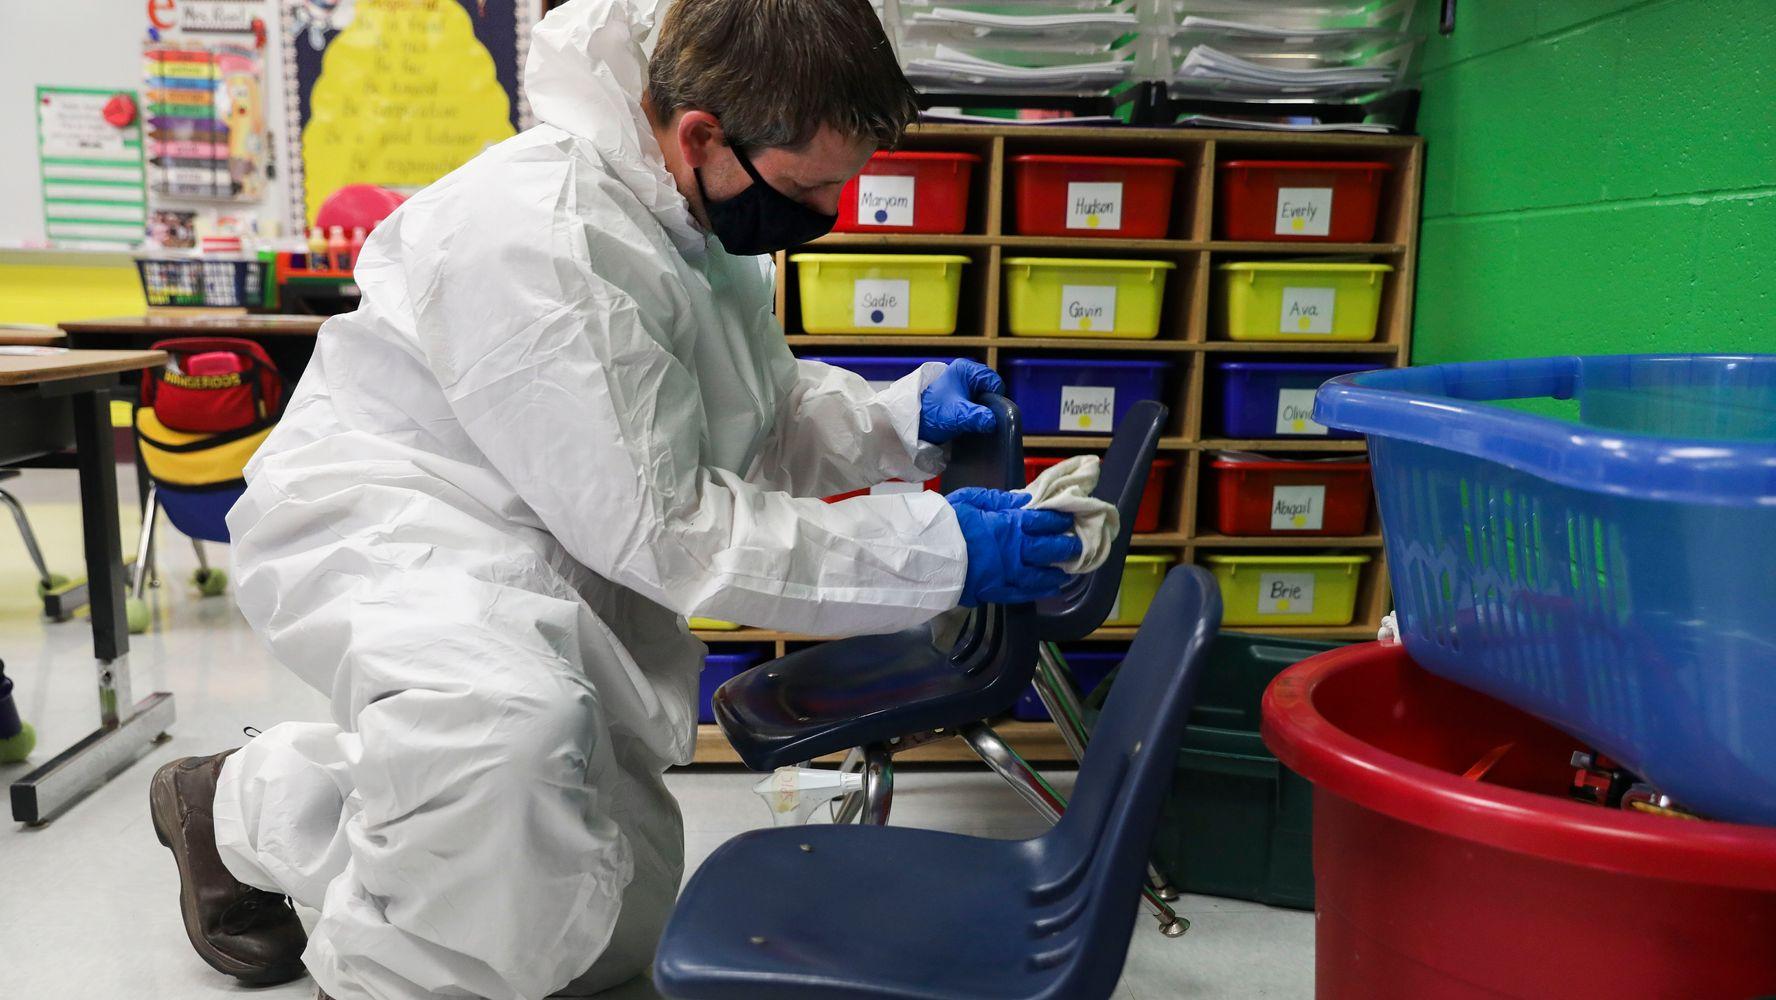 U.S. Becomes First Nation To Surpass 10 Million Coronavirus Cases